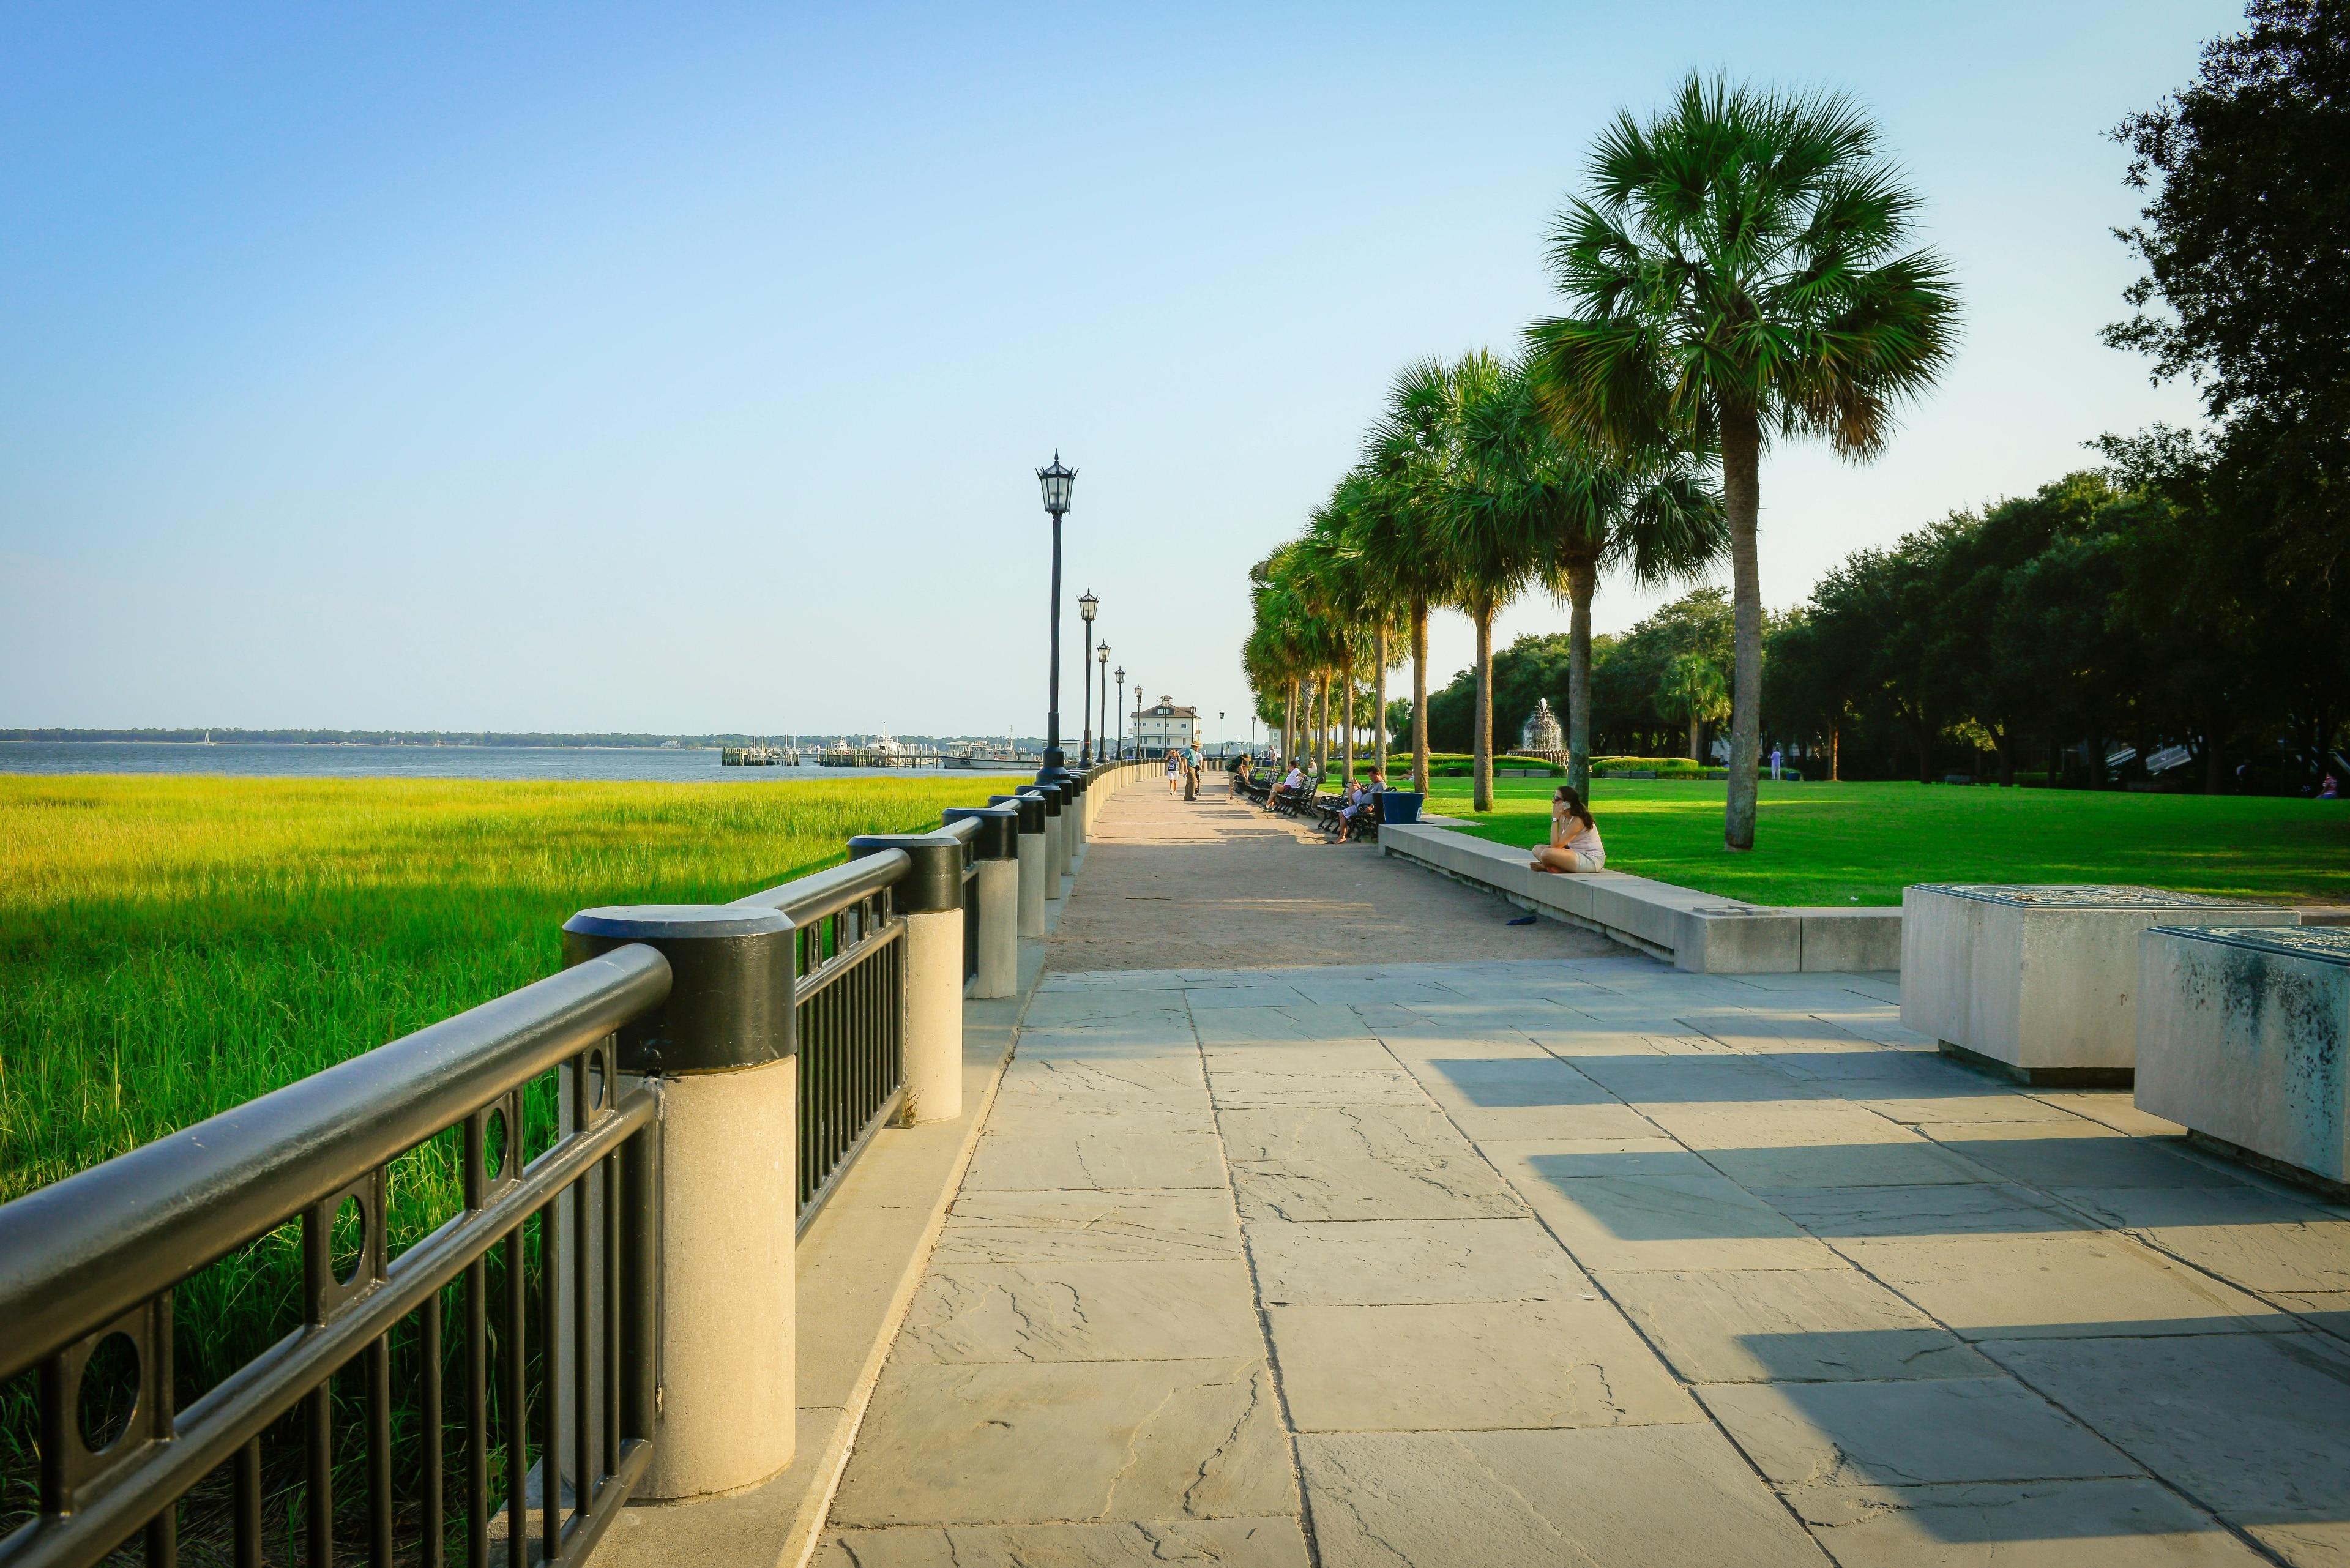 North Charleston, South Carolina, USA